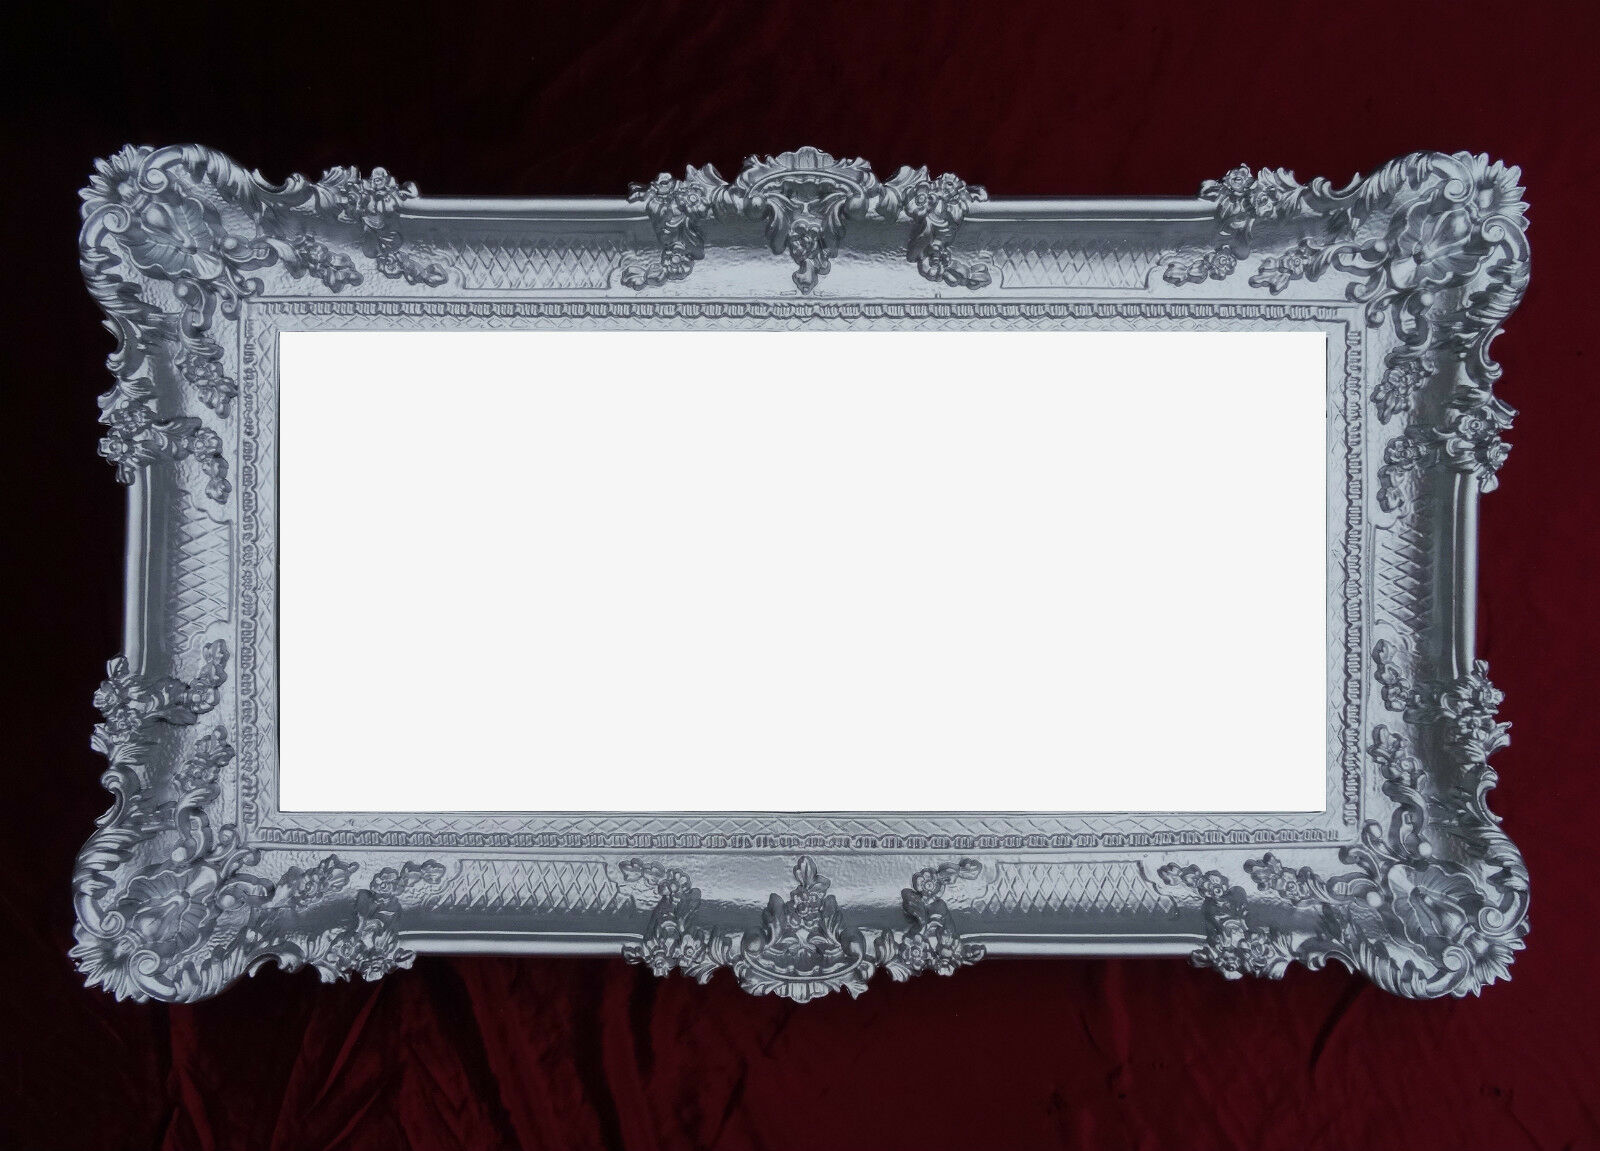 baroque wall mirror black gold mirror wall deco deco 97x57 antique big ebay. Black Bedroom Furniture Sets. Home Design Ideas